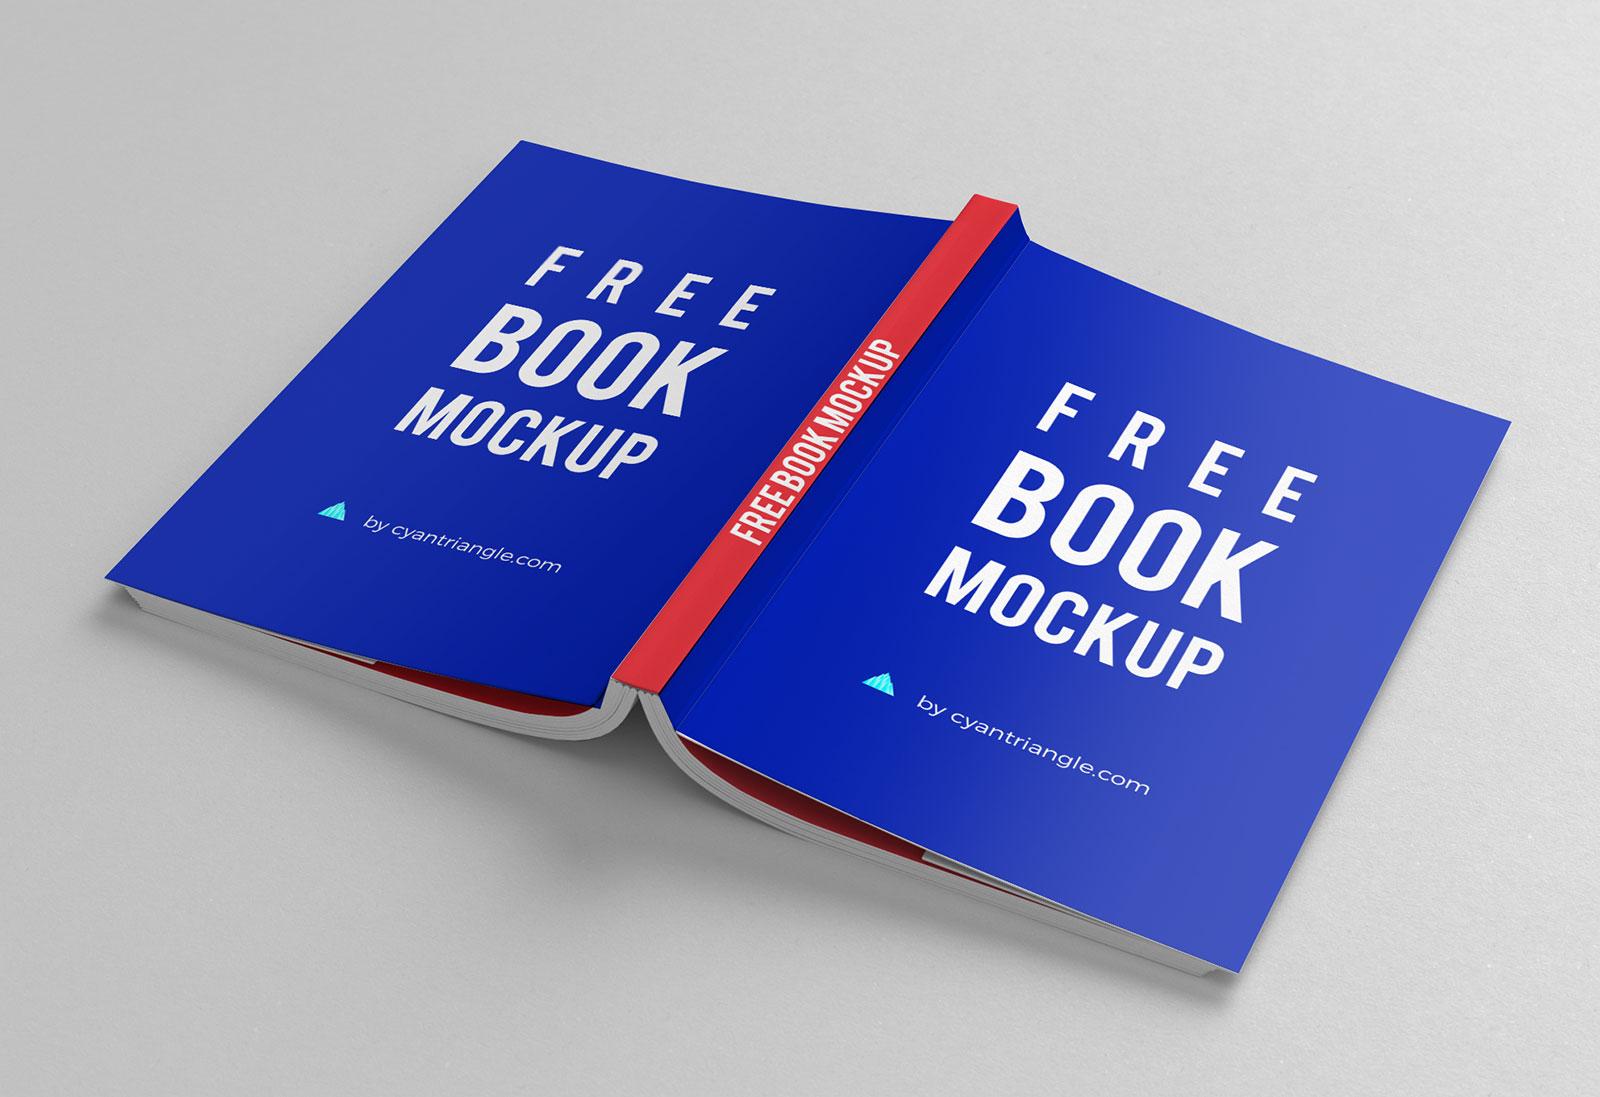 10 Free Hardcover Book Mockup PSD Set - Good Mockups